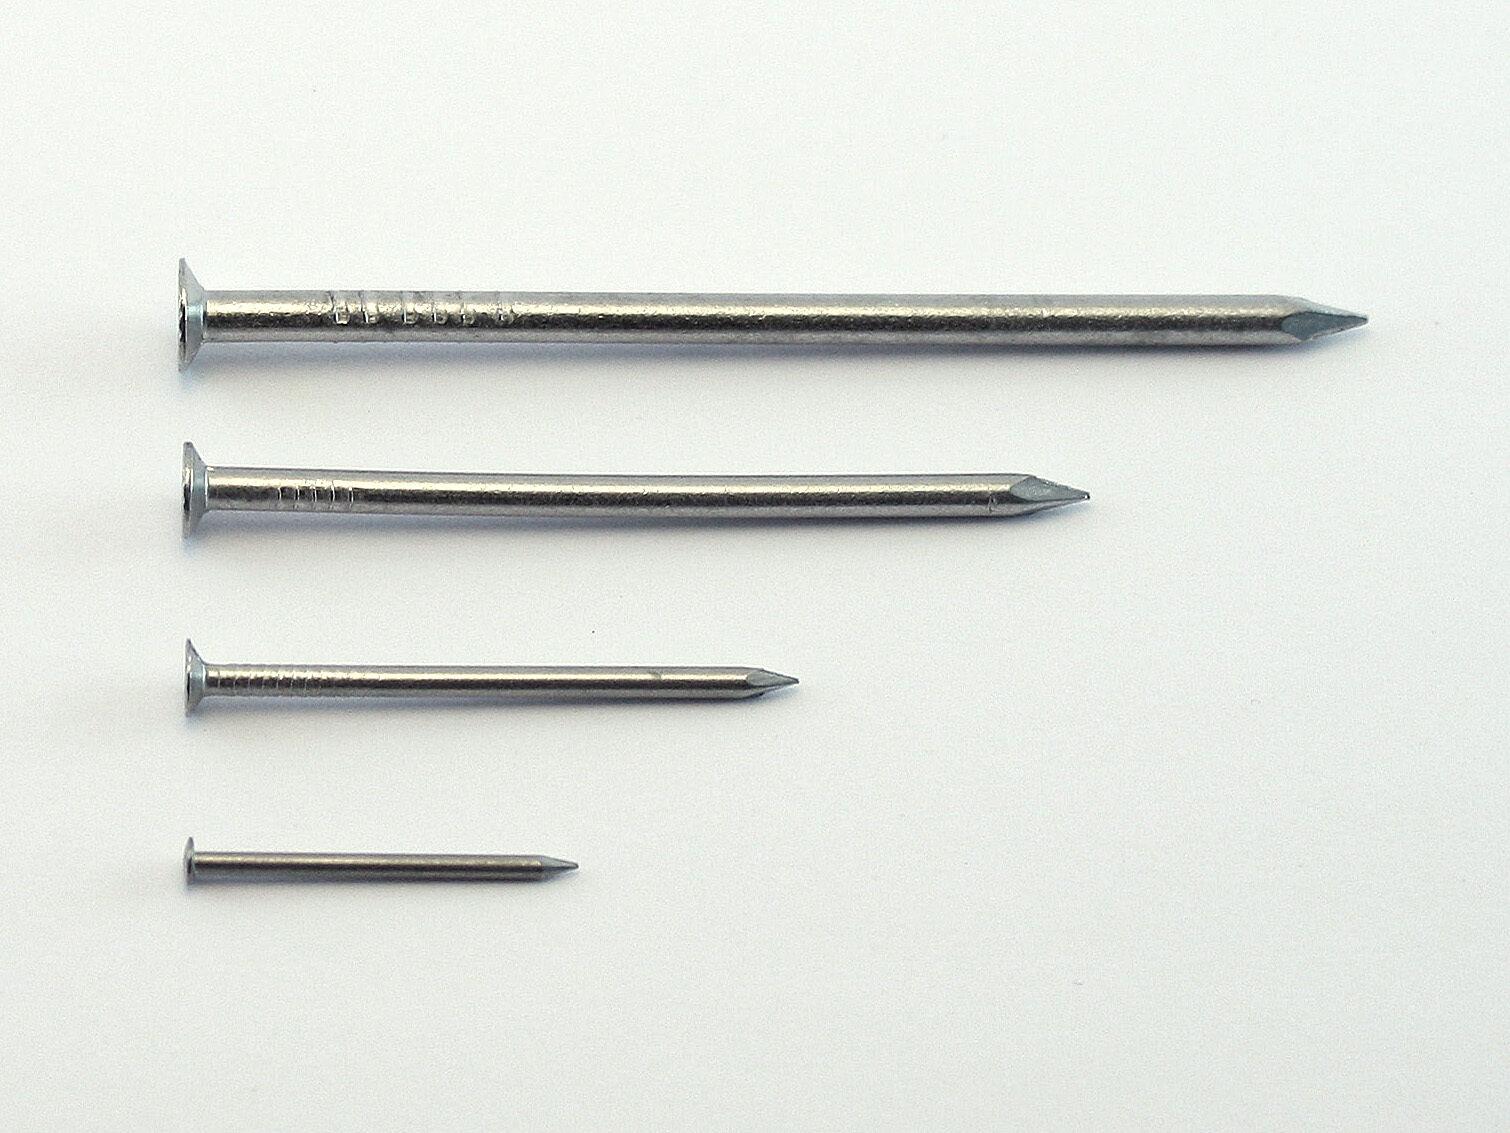 Drahtstifte Edelstahl V2A Nägel 1,5 - 6 mm Senkkopf 1 2,5 kg made in Germany